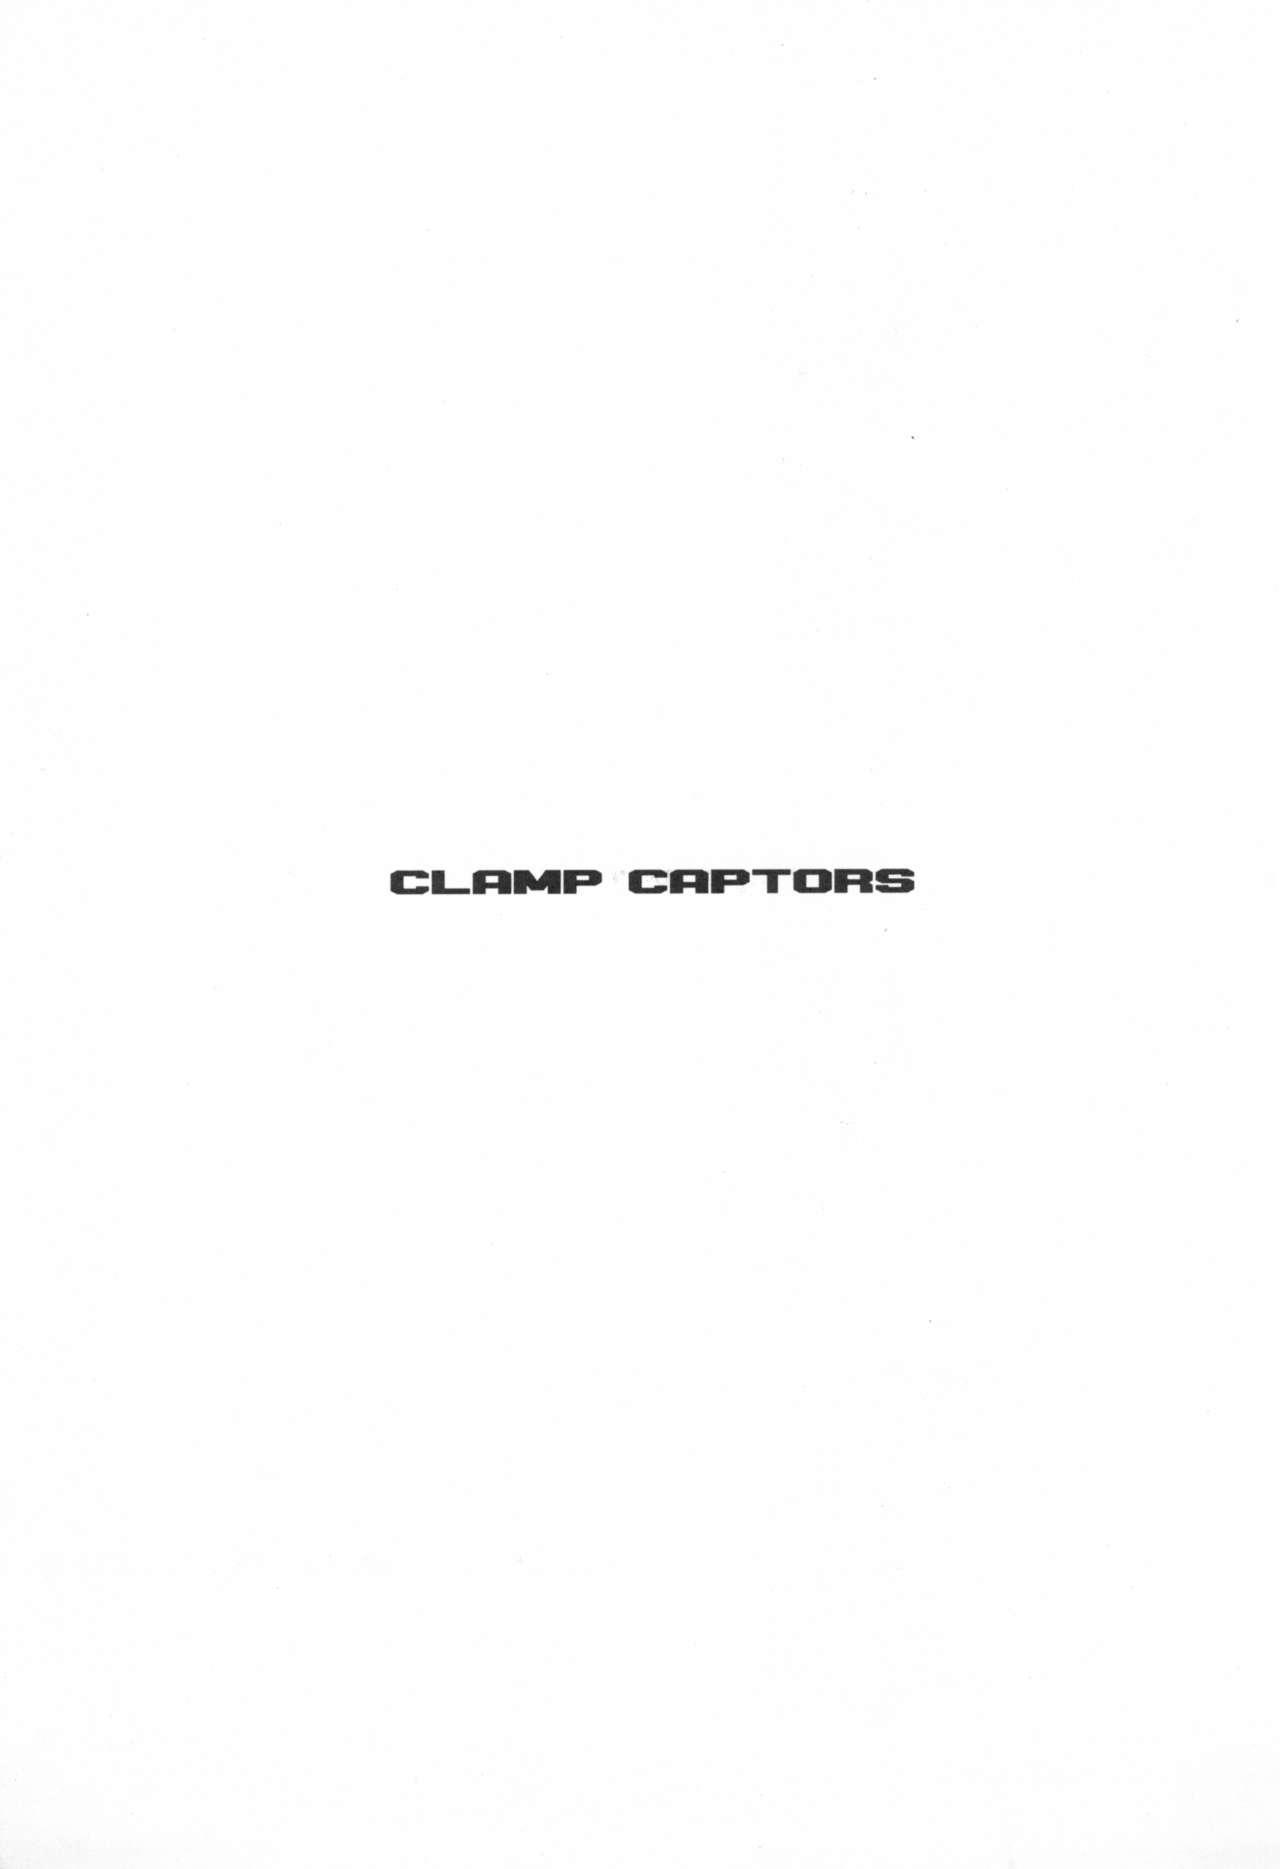 ClampCaptors 2